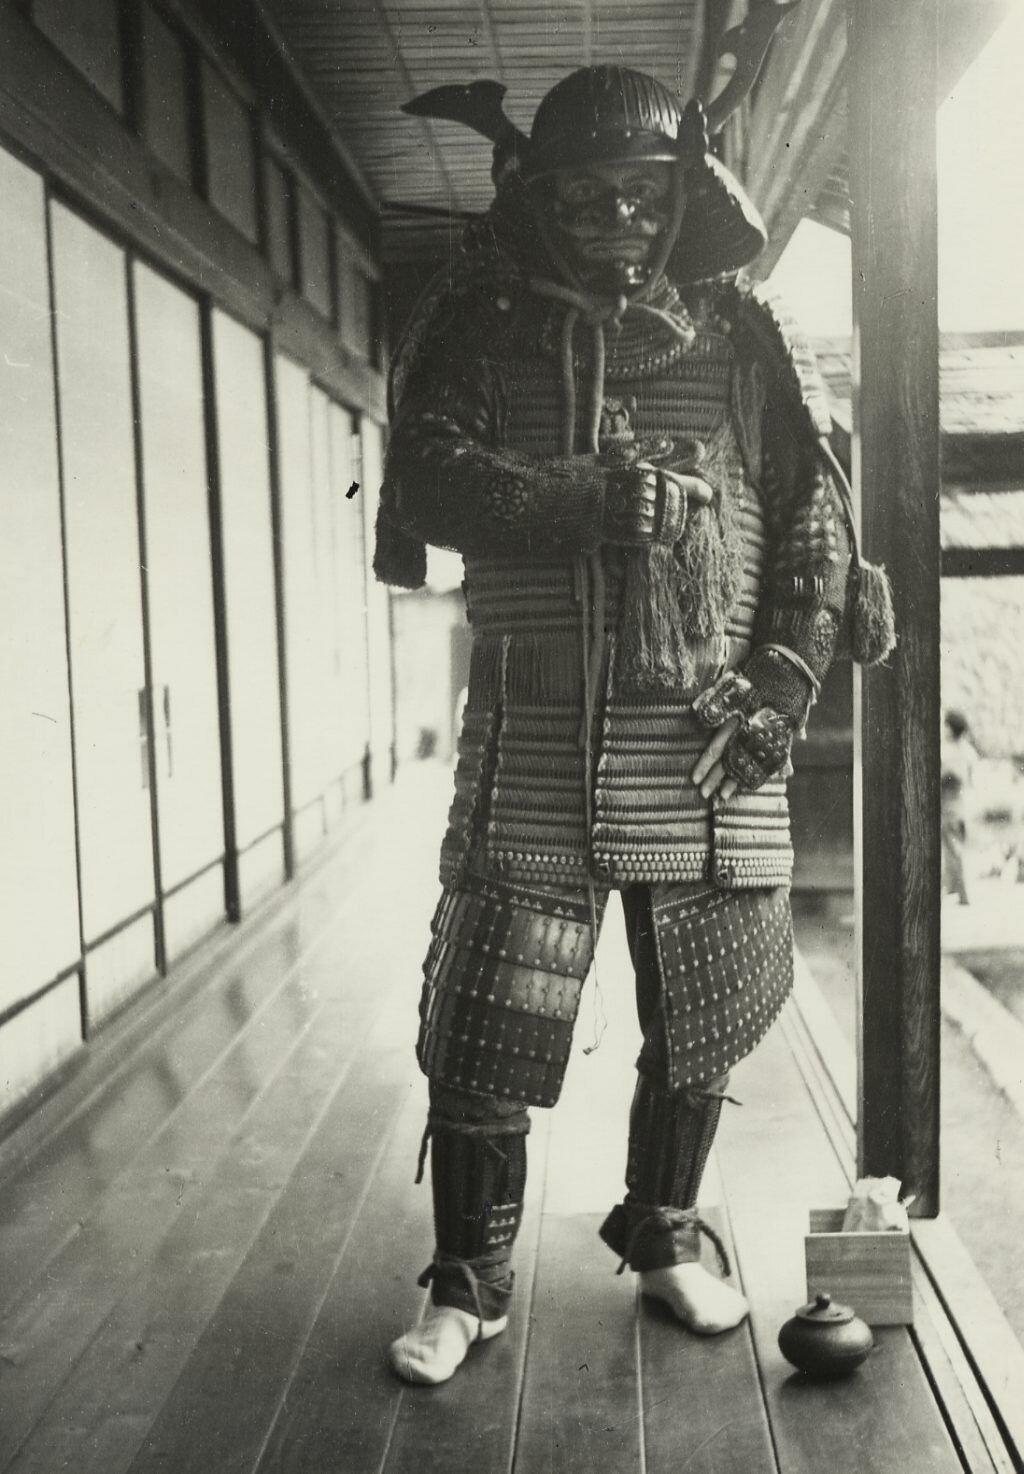 сидела ждала самурай на фото существовании все знали